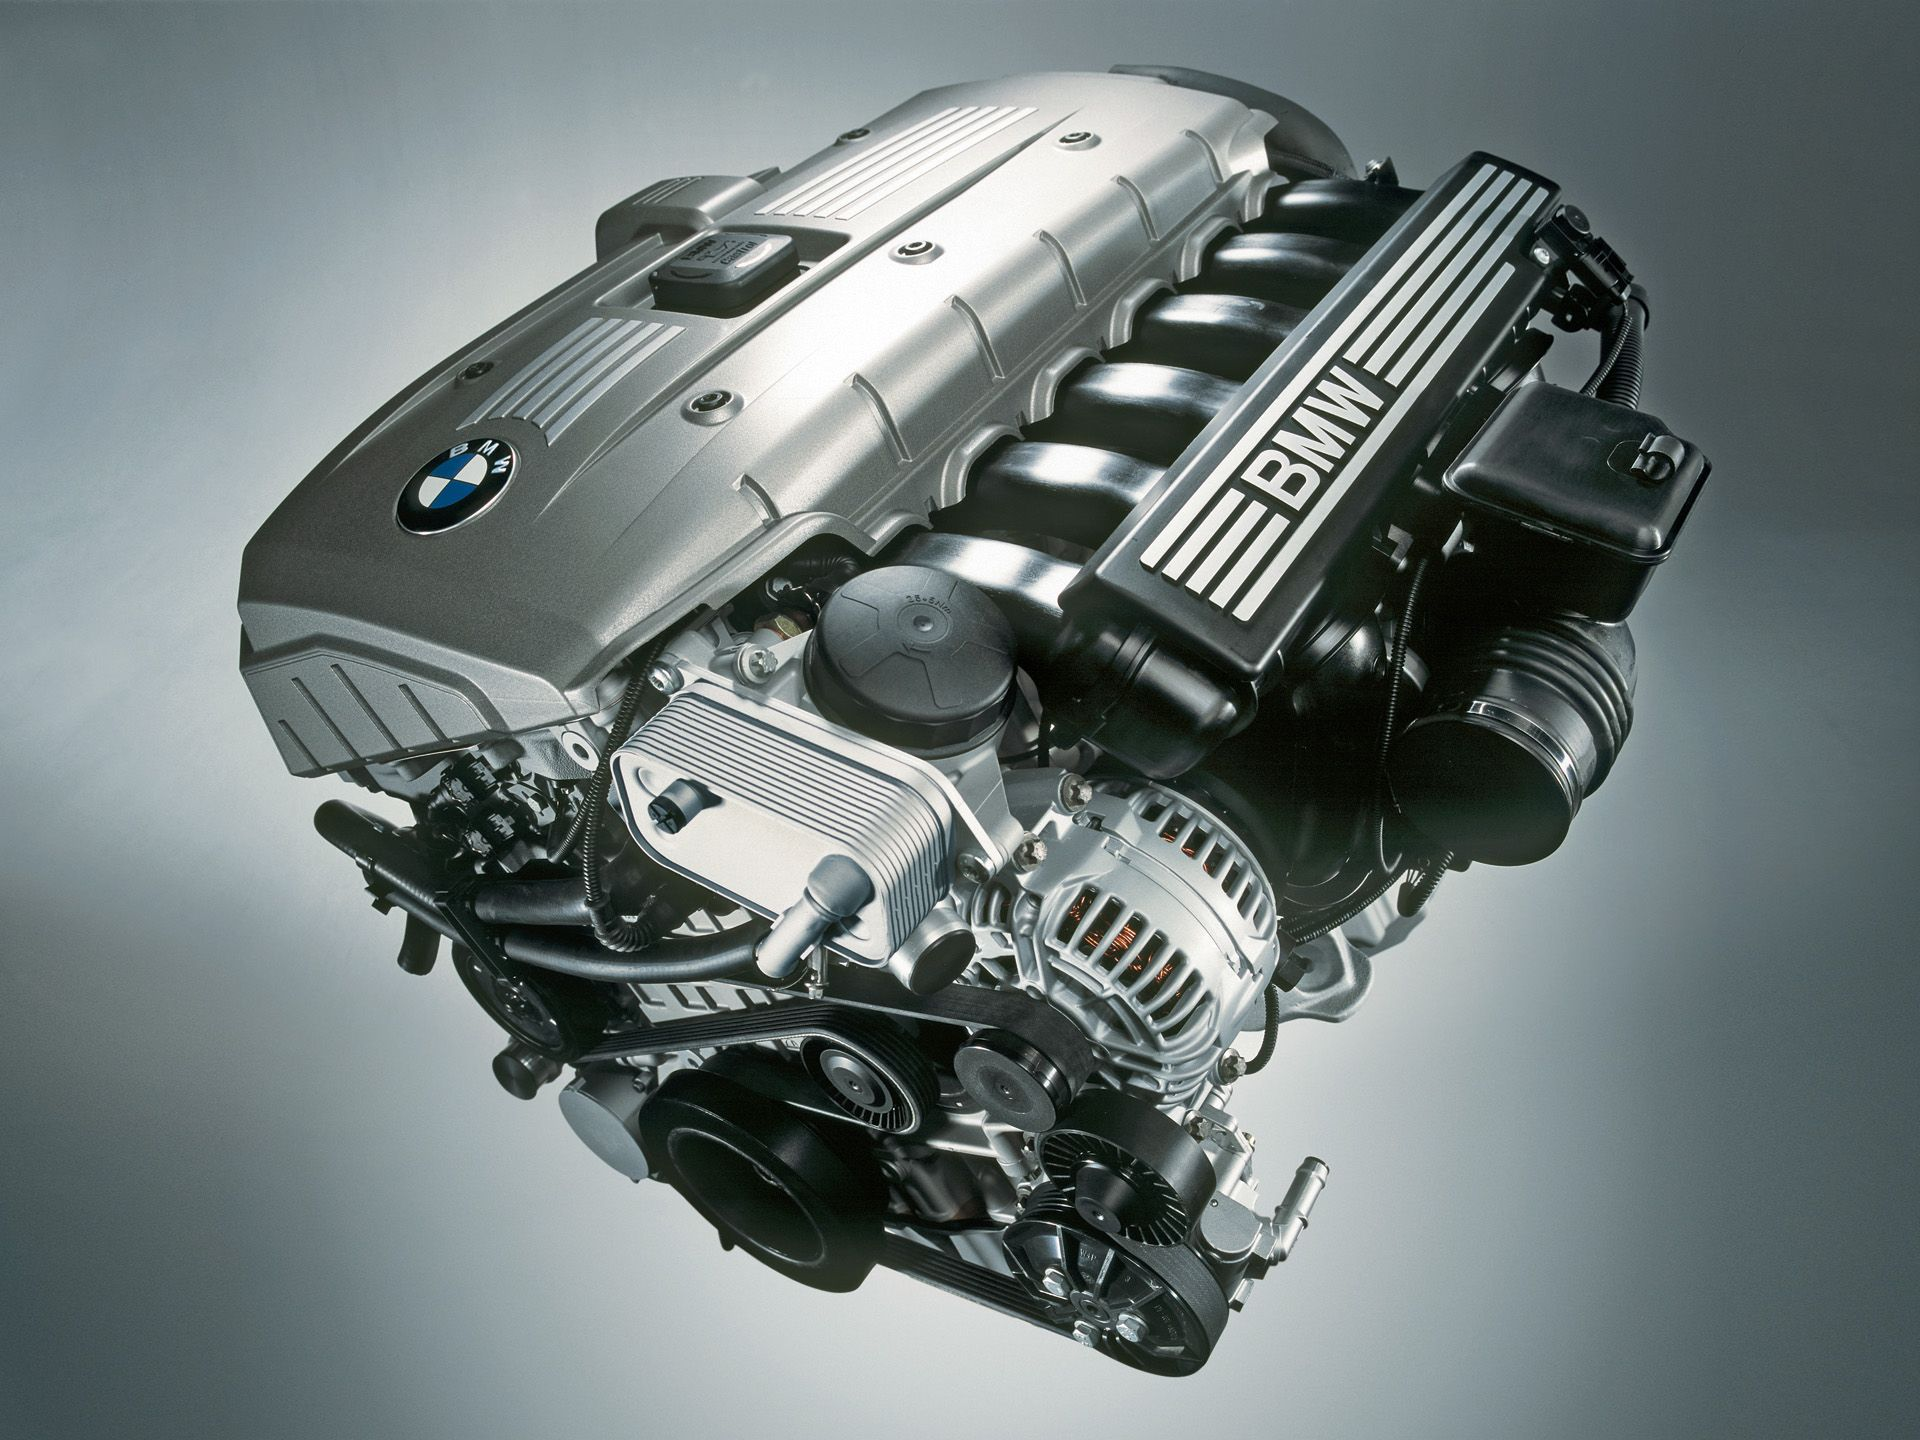 Bmw Nl Straight 6 Engine Block Bmw E36 Manual Transmission Visit